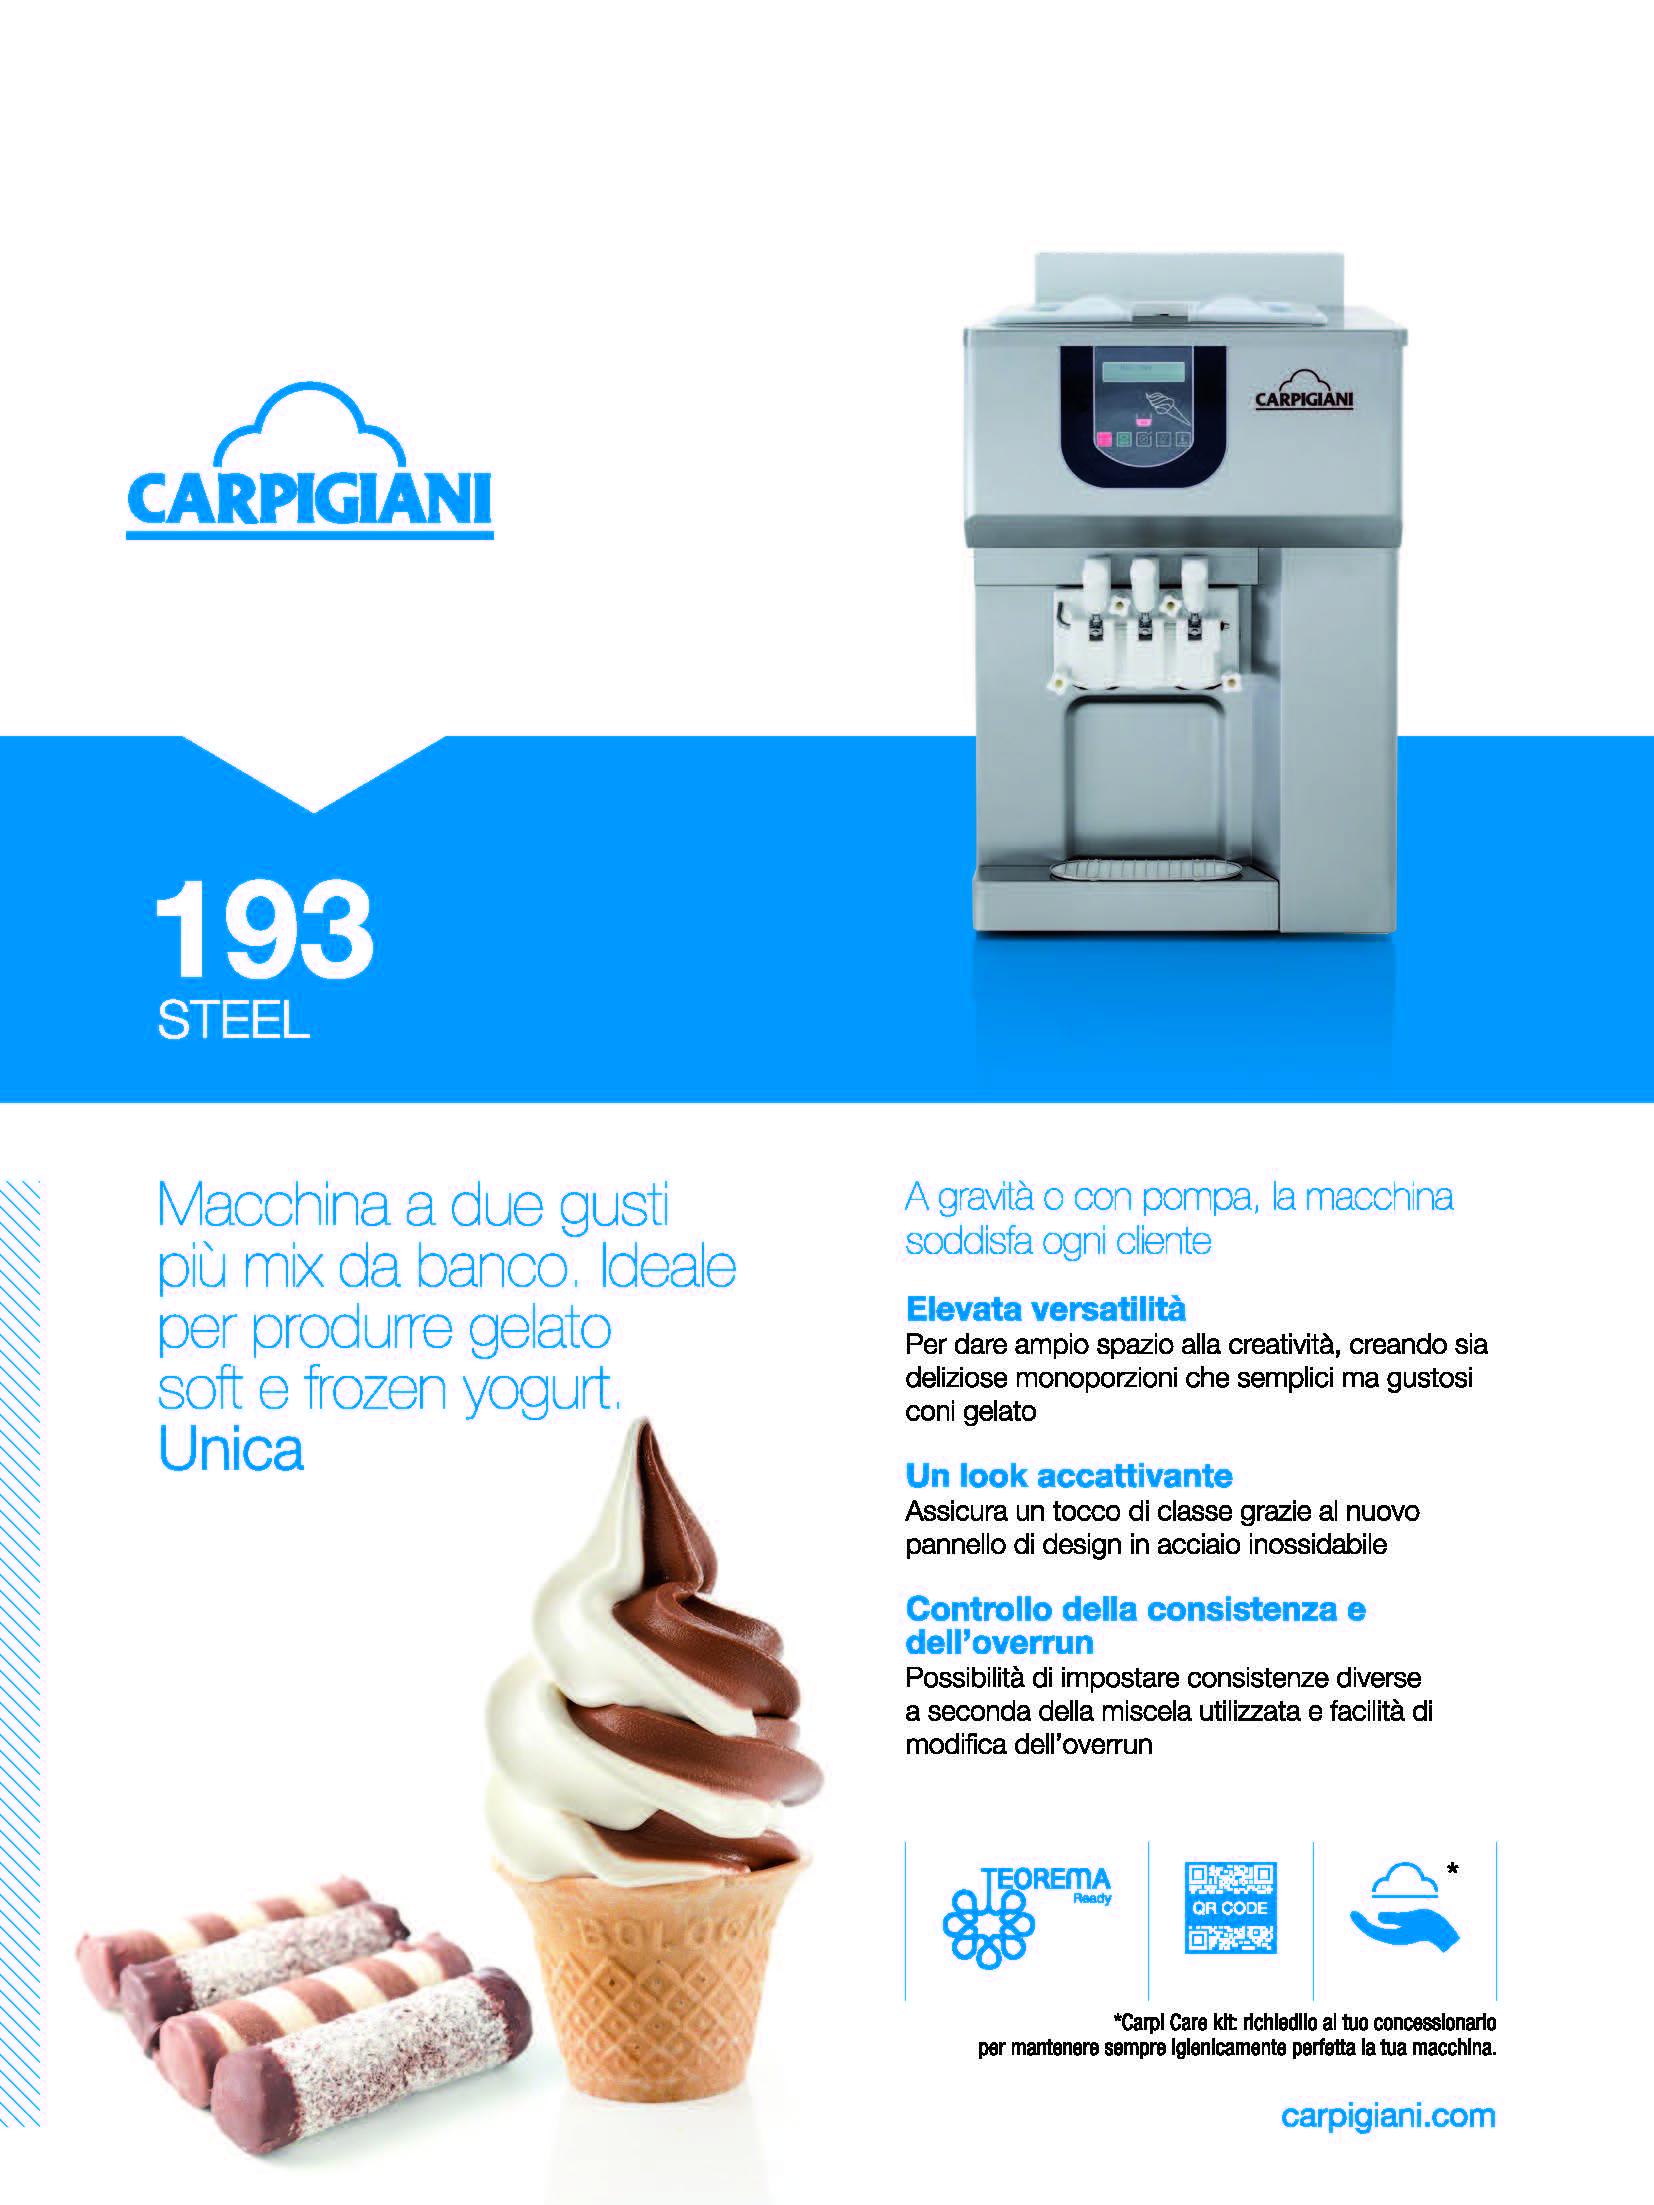 Carpigiani – 193 Steel